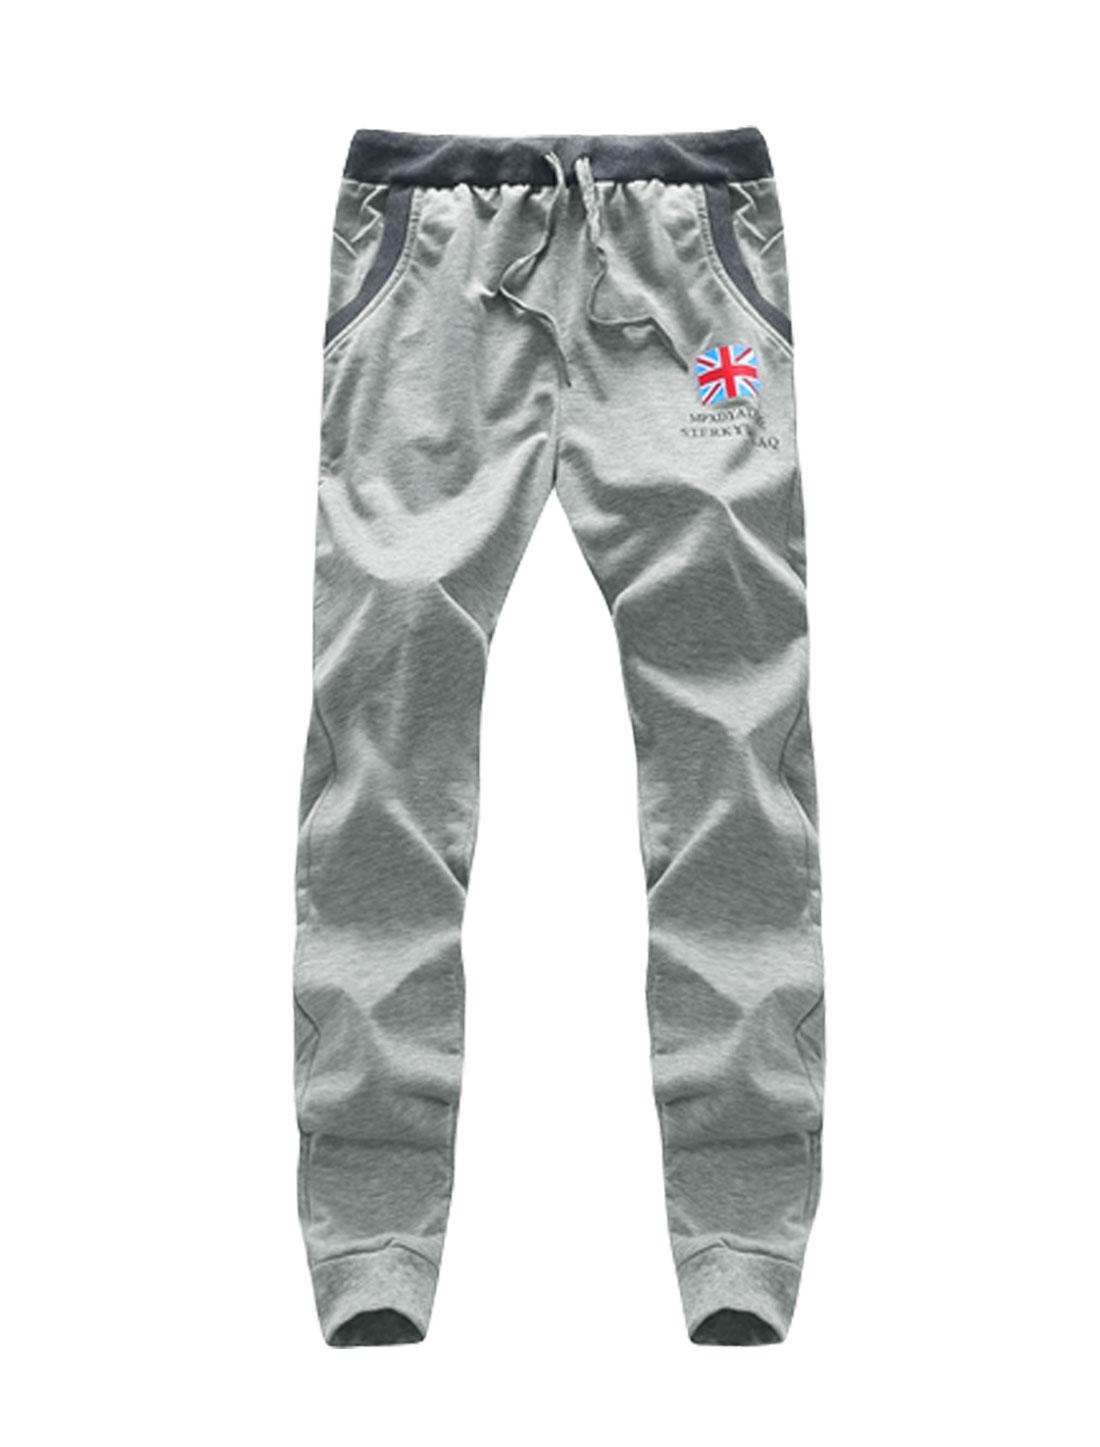 Men Flag Print Letters Drawstring Waist Sweatpants Light Gray W30